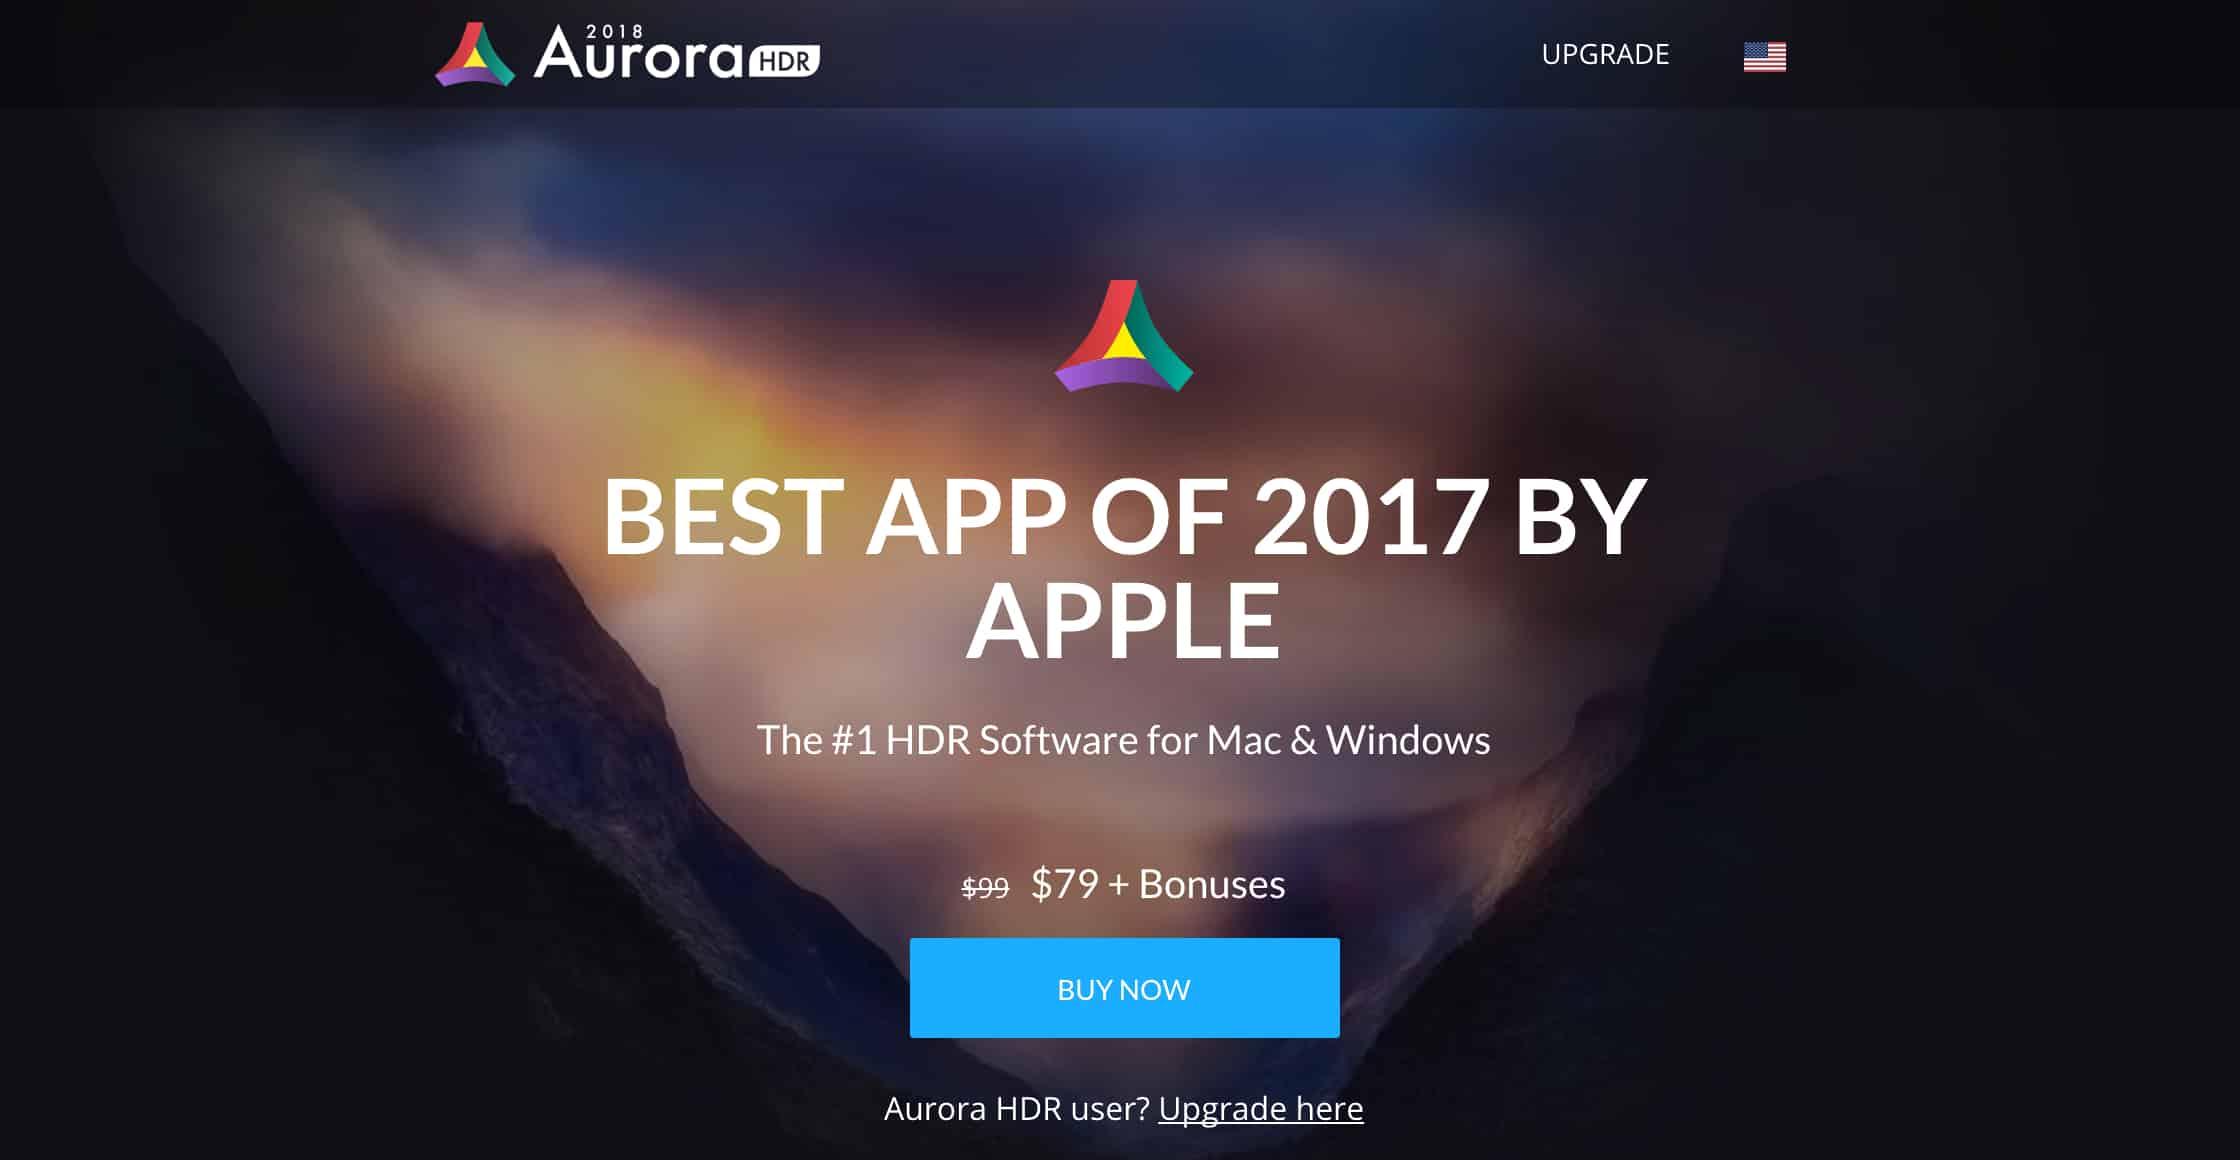 Aurora HDR 2018 - Mac App Of The Year 2017 (1)